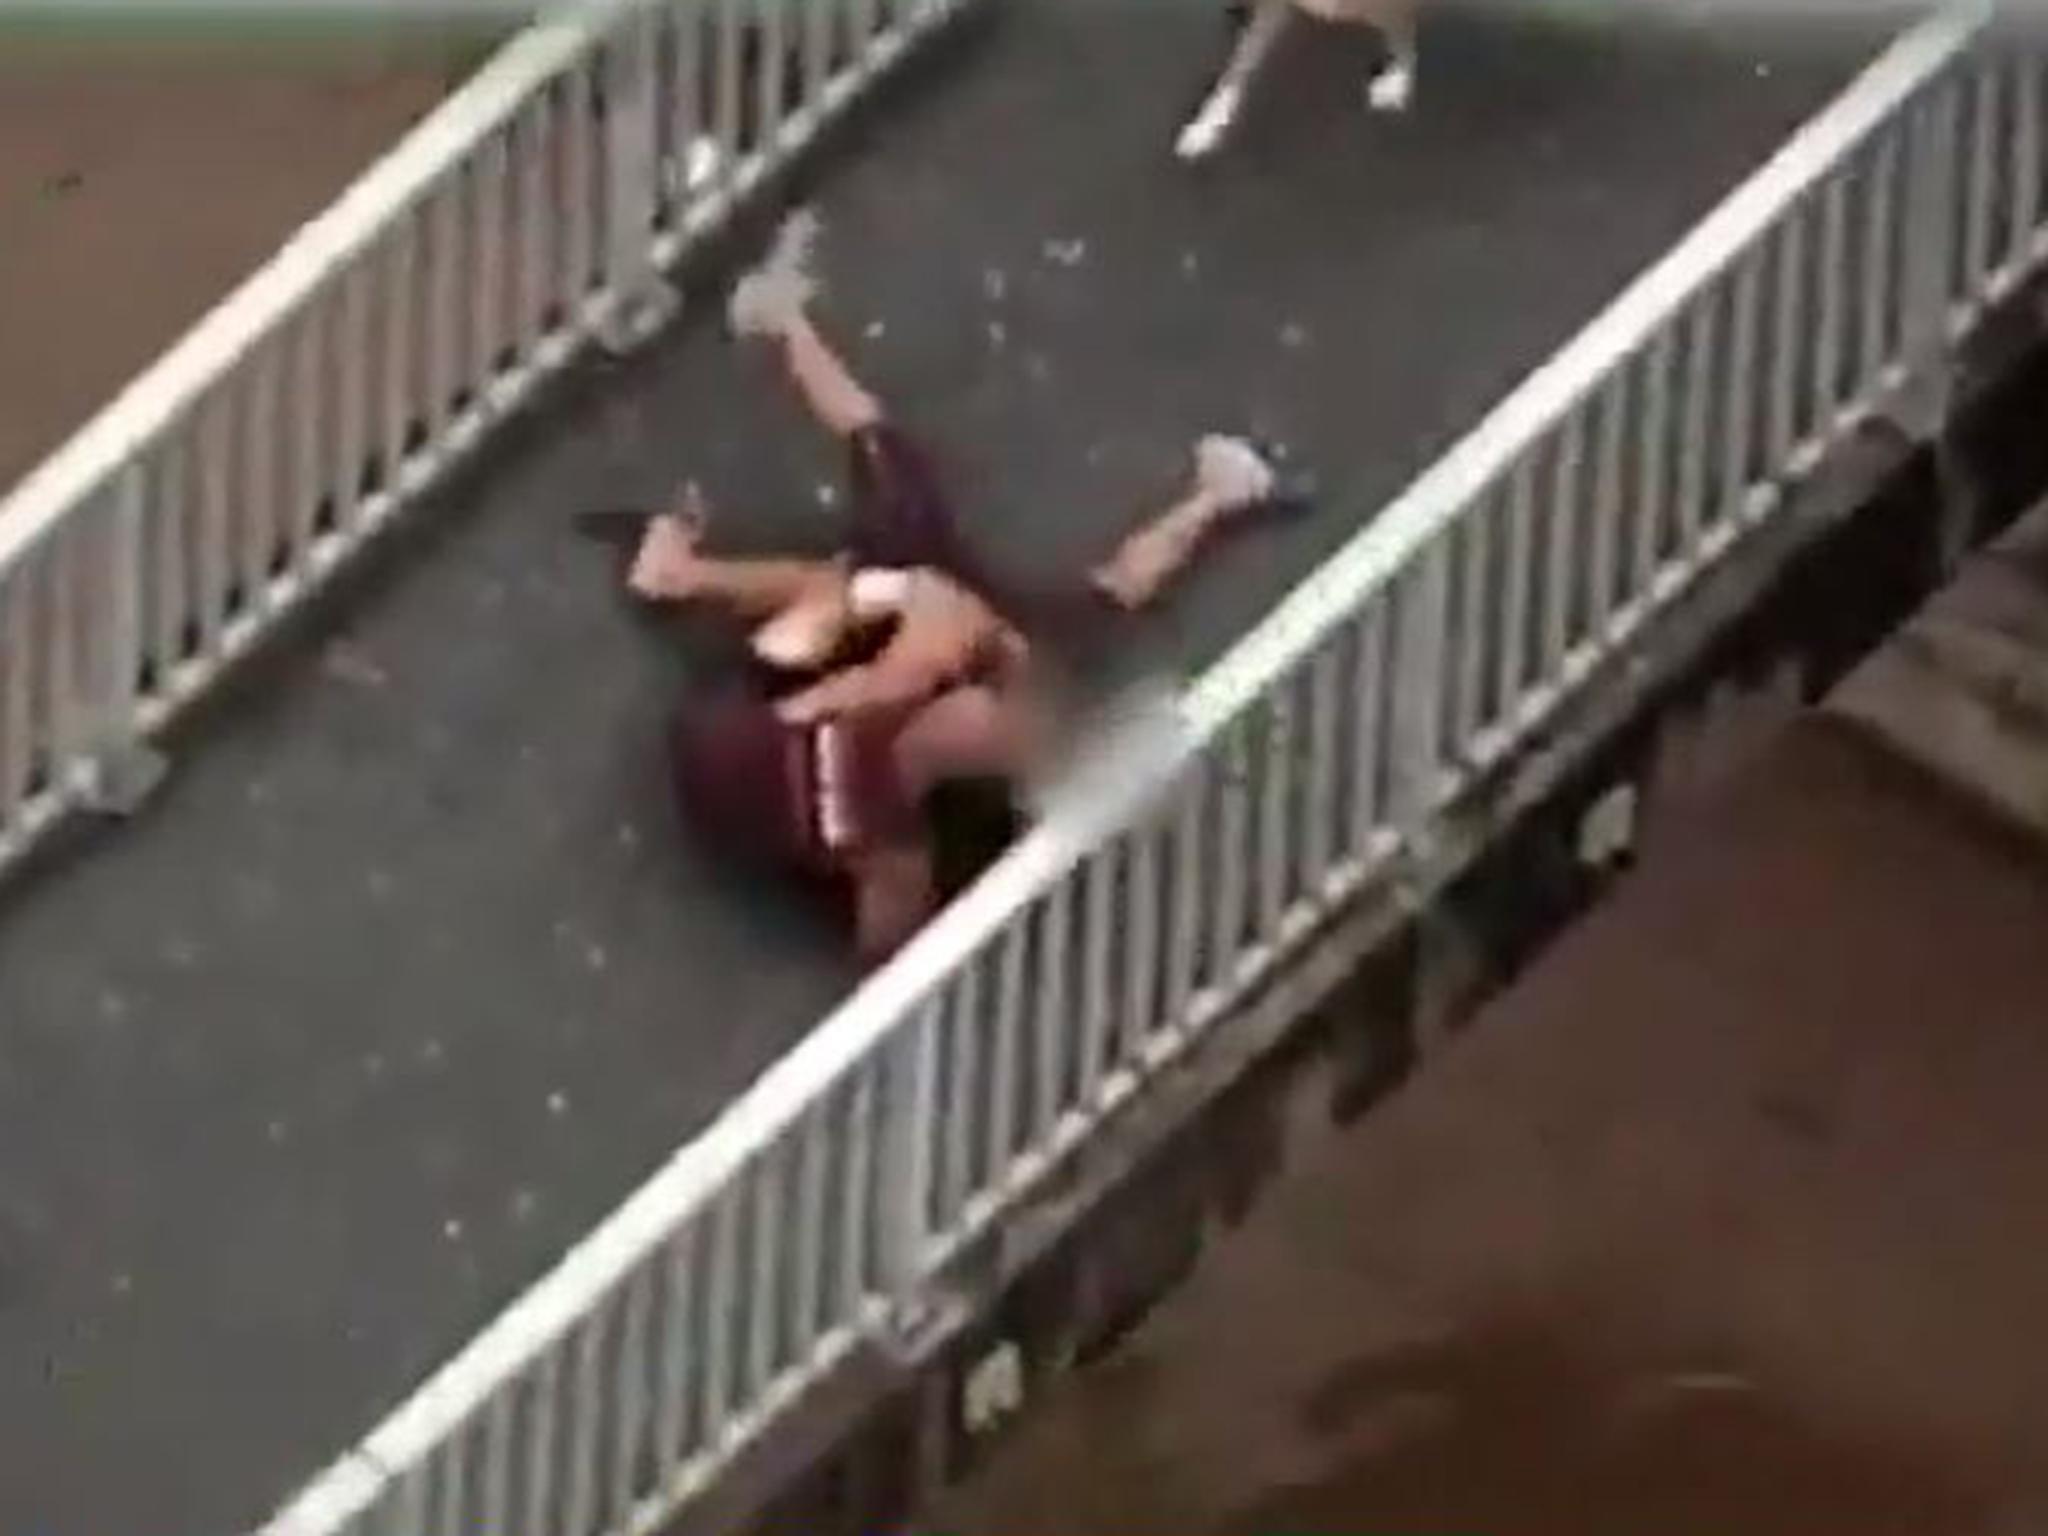 Dog walker wrestles fugitive to the ground then high-fives police